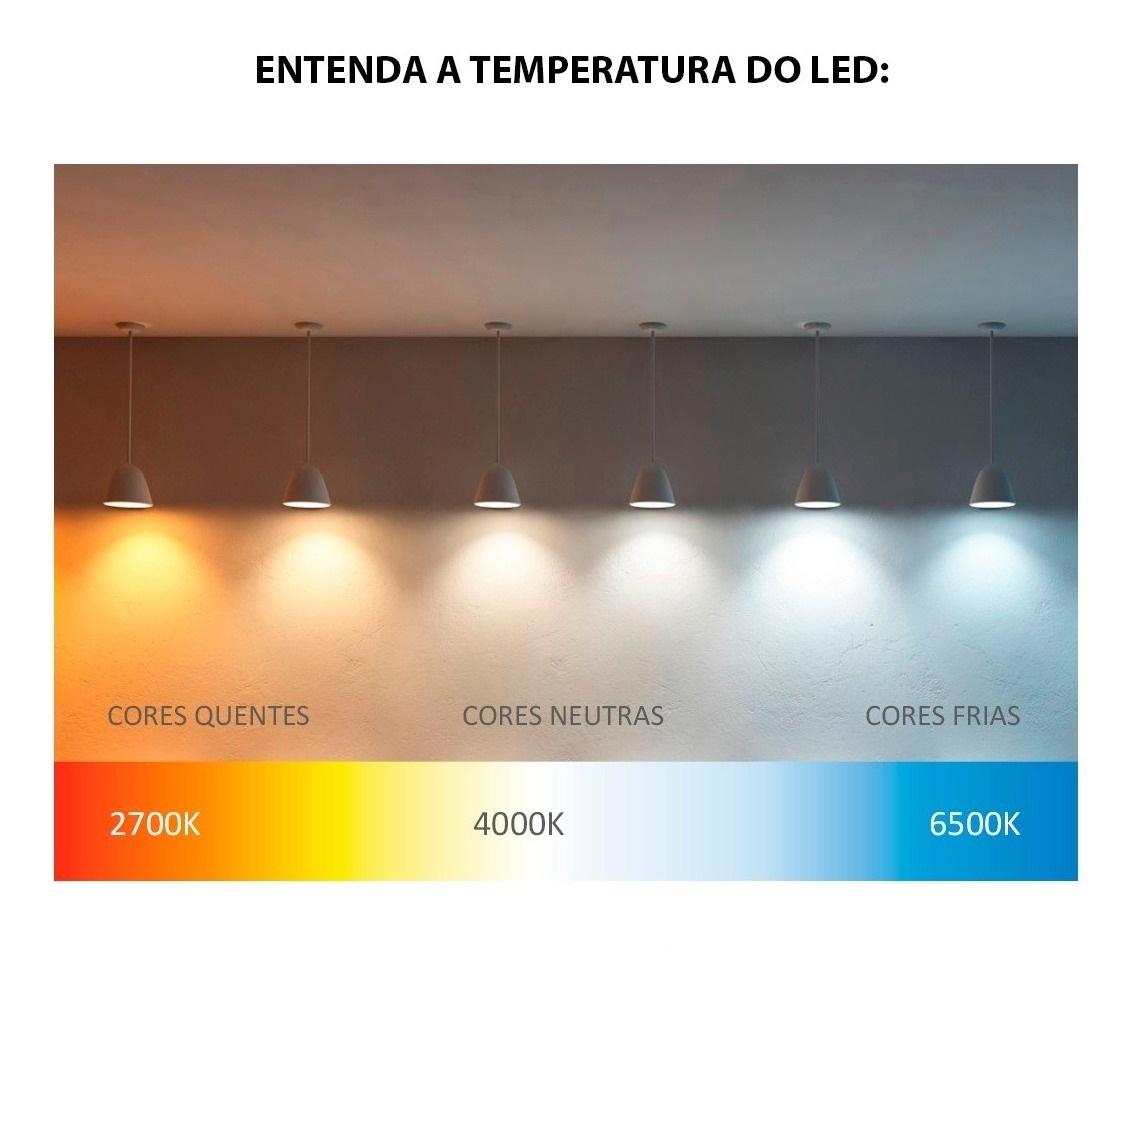 Refletor de Led 200w Preto Luz Fria Blumenau